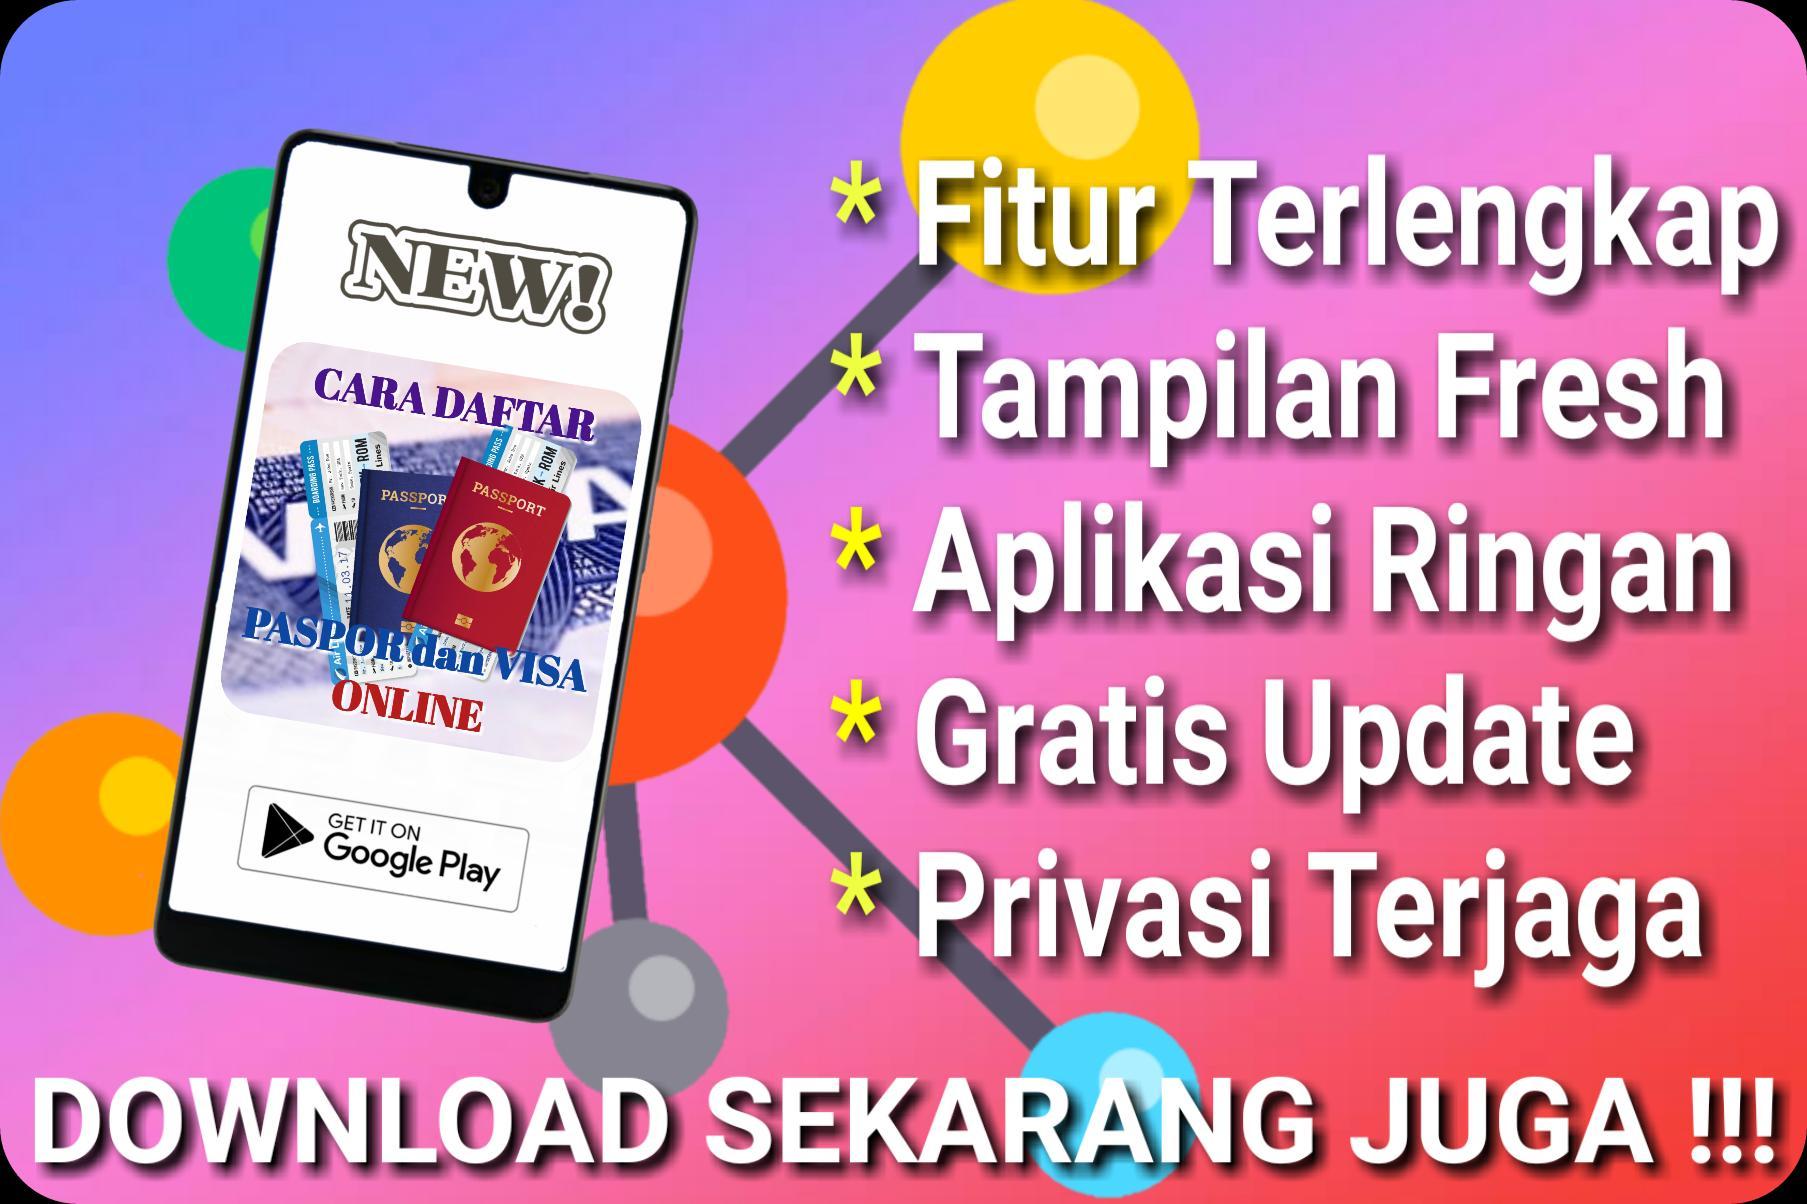 Cara Daftar Paspor Online For Android Apk Download